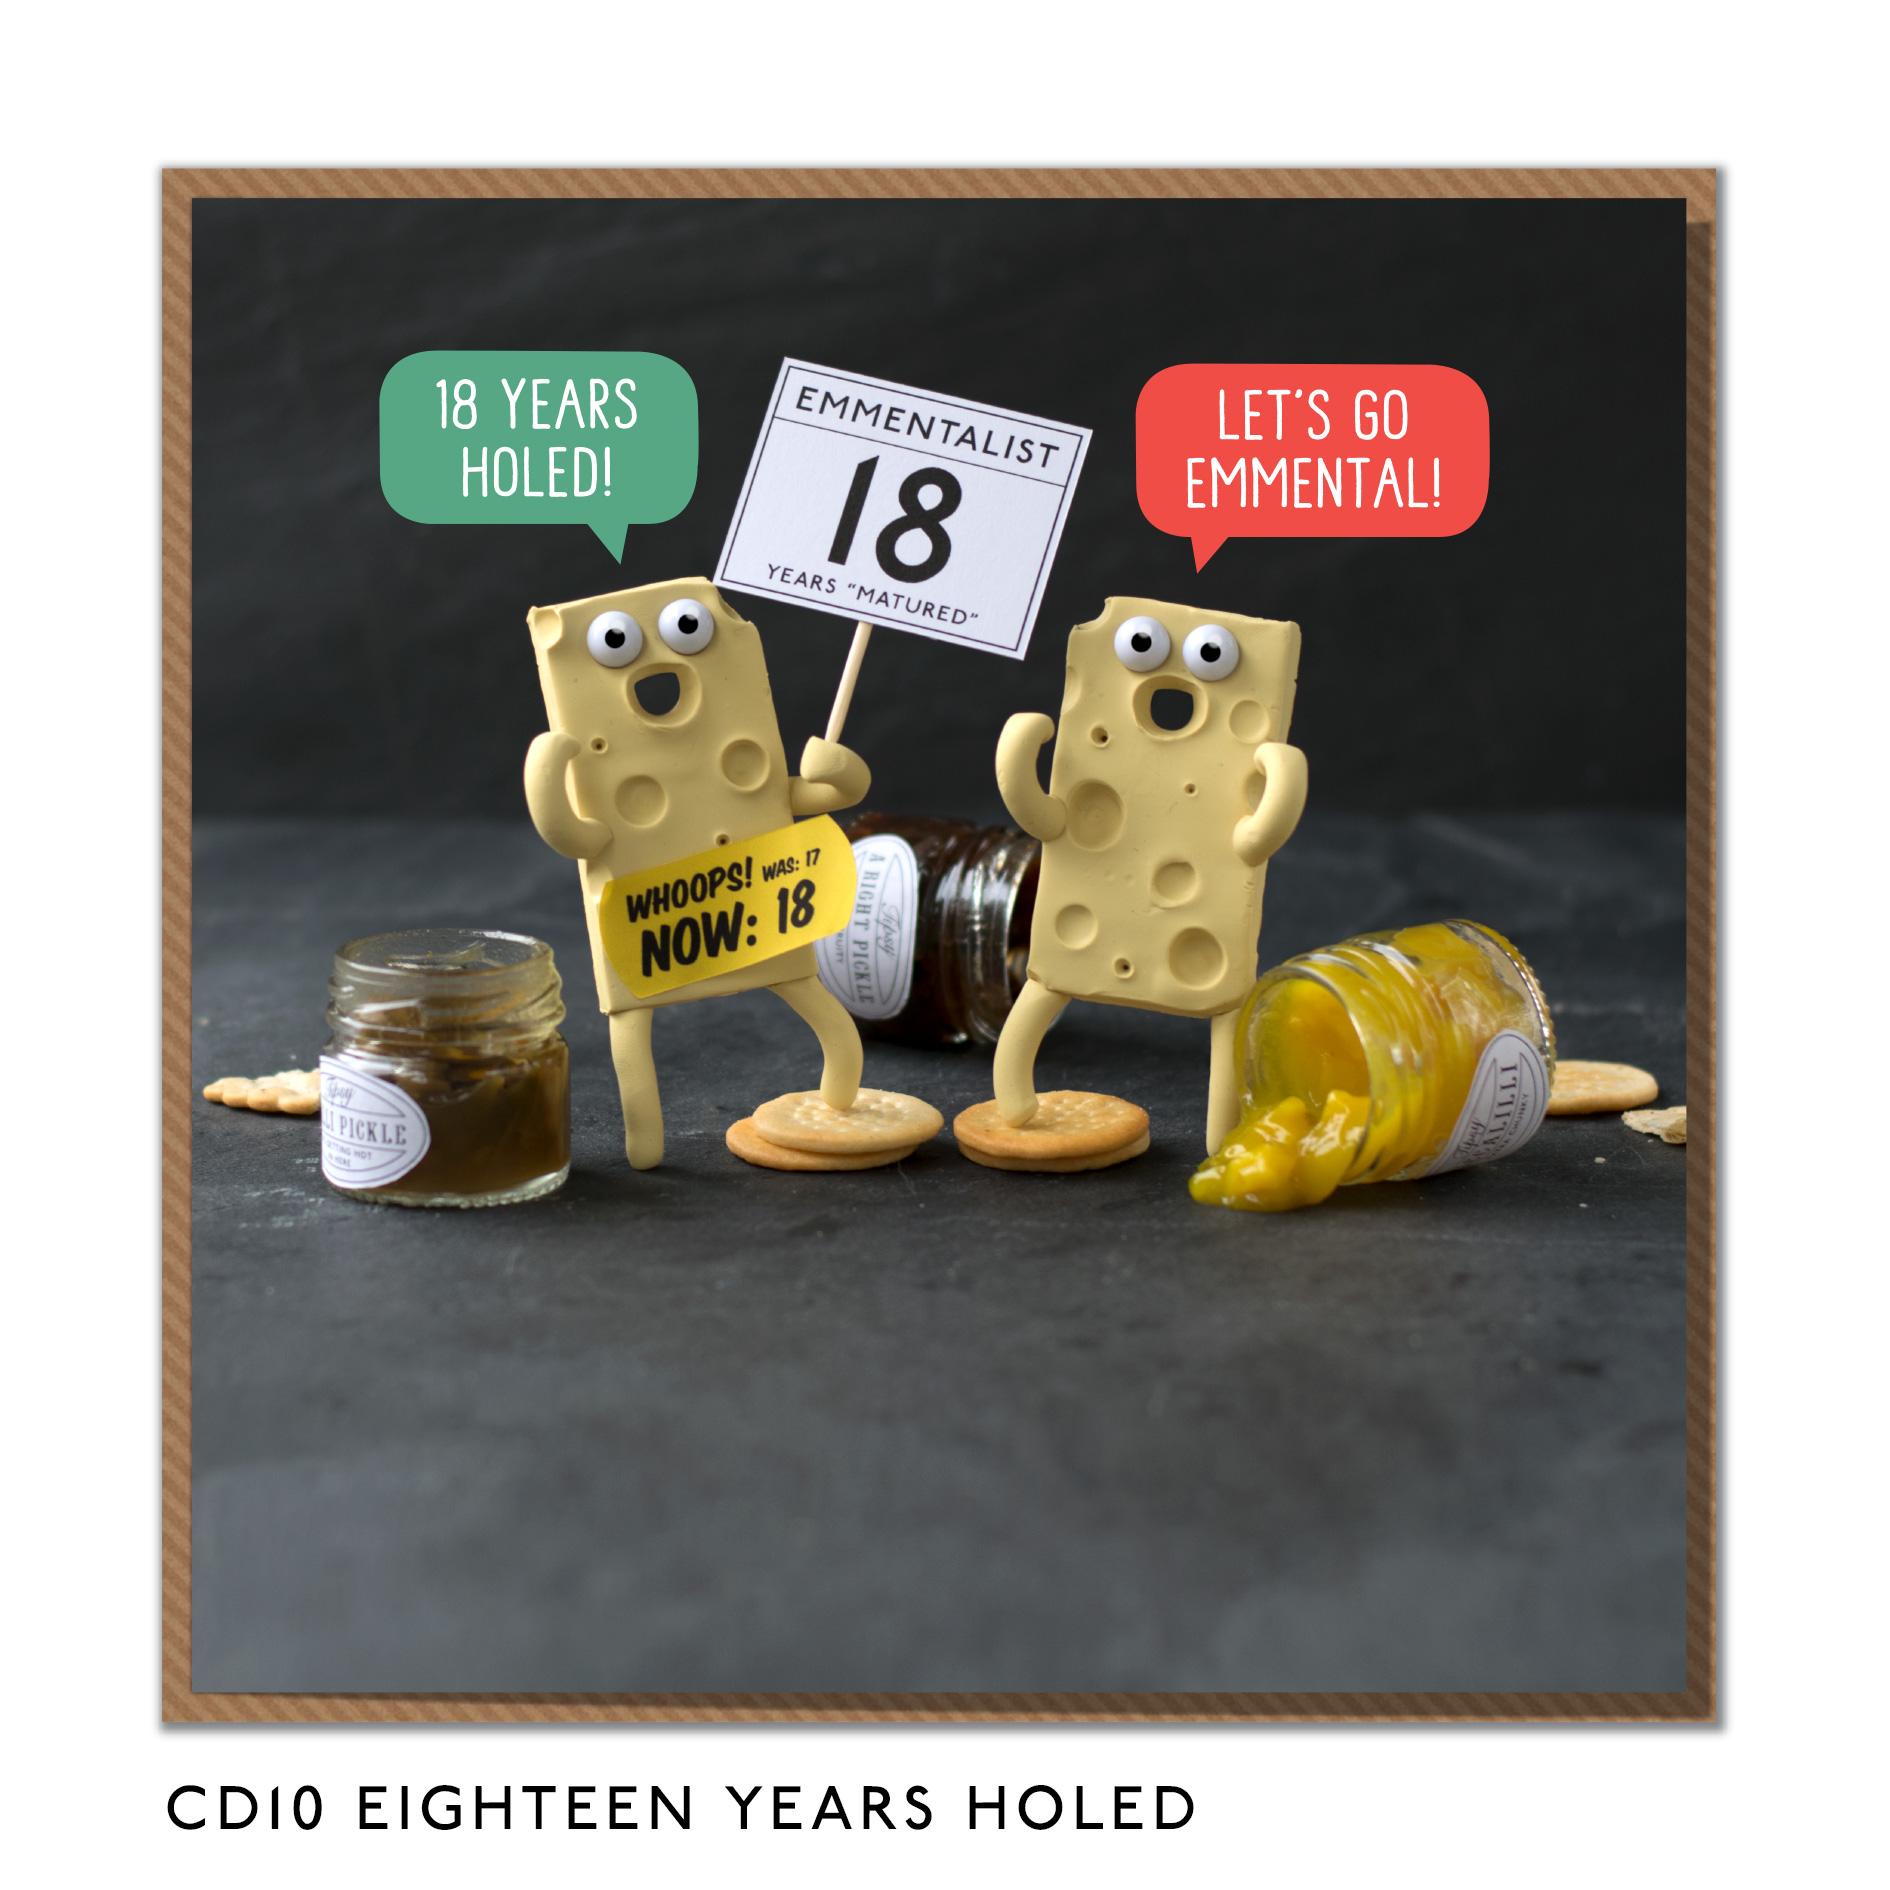 CD10-EIGHTEEN-YEARS-HOLED.jpg